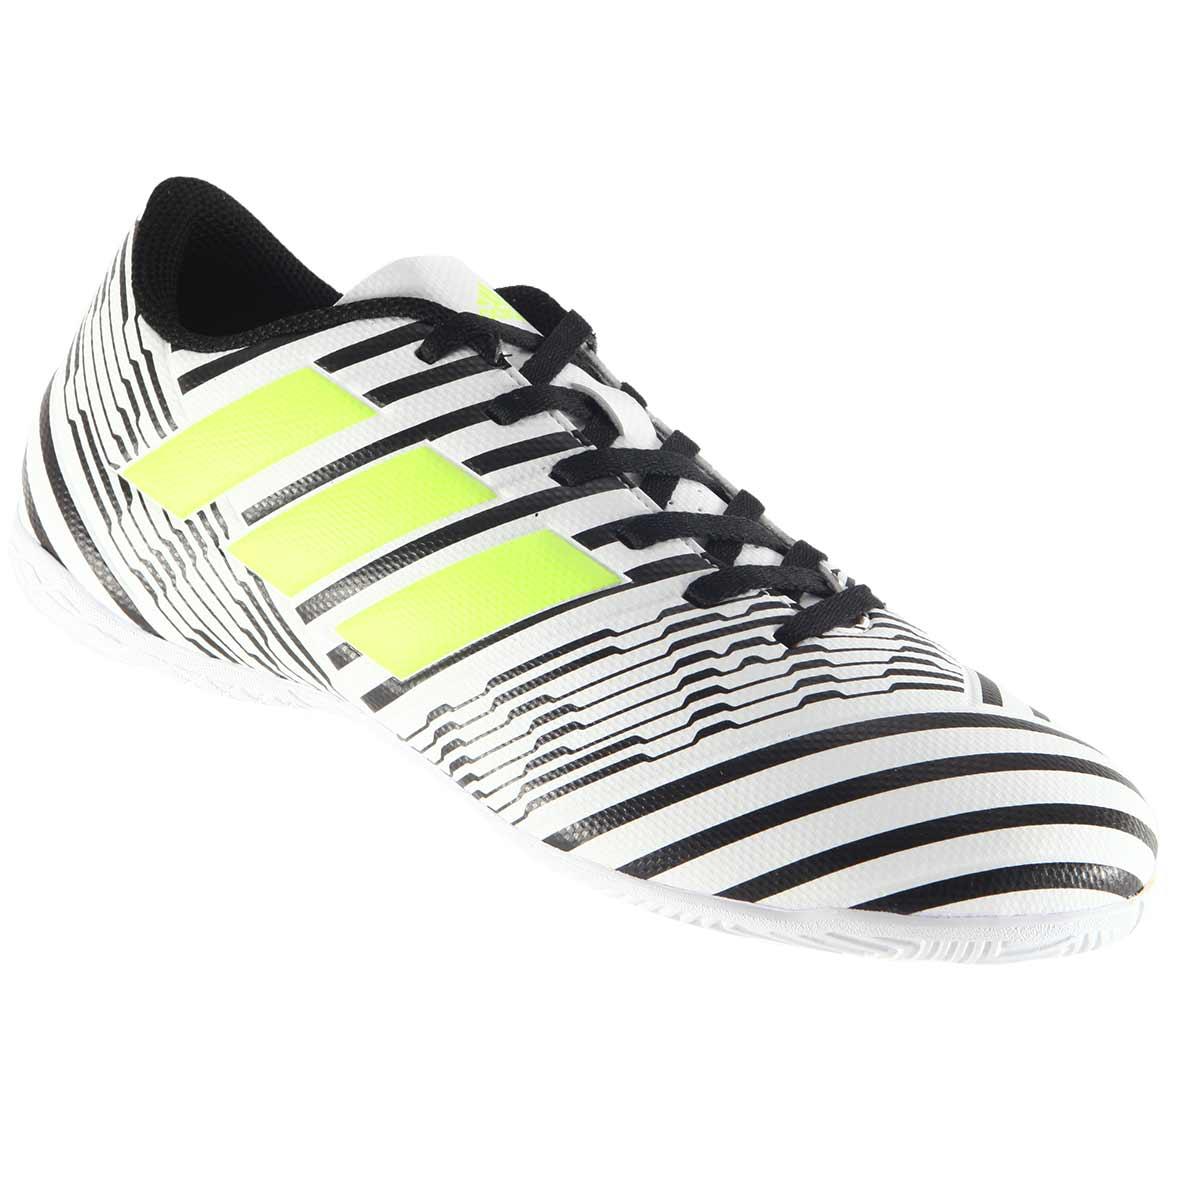 Chuteira Adidas Nemeziz 17.4 IN Futsal S82473